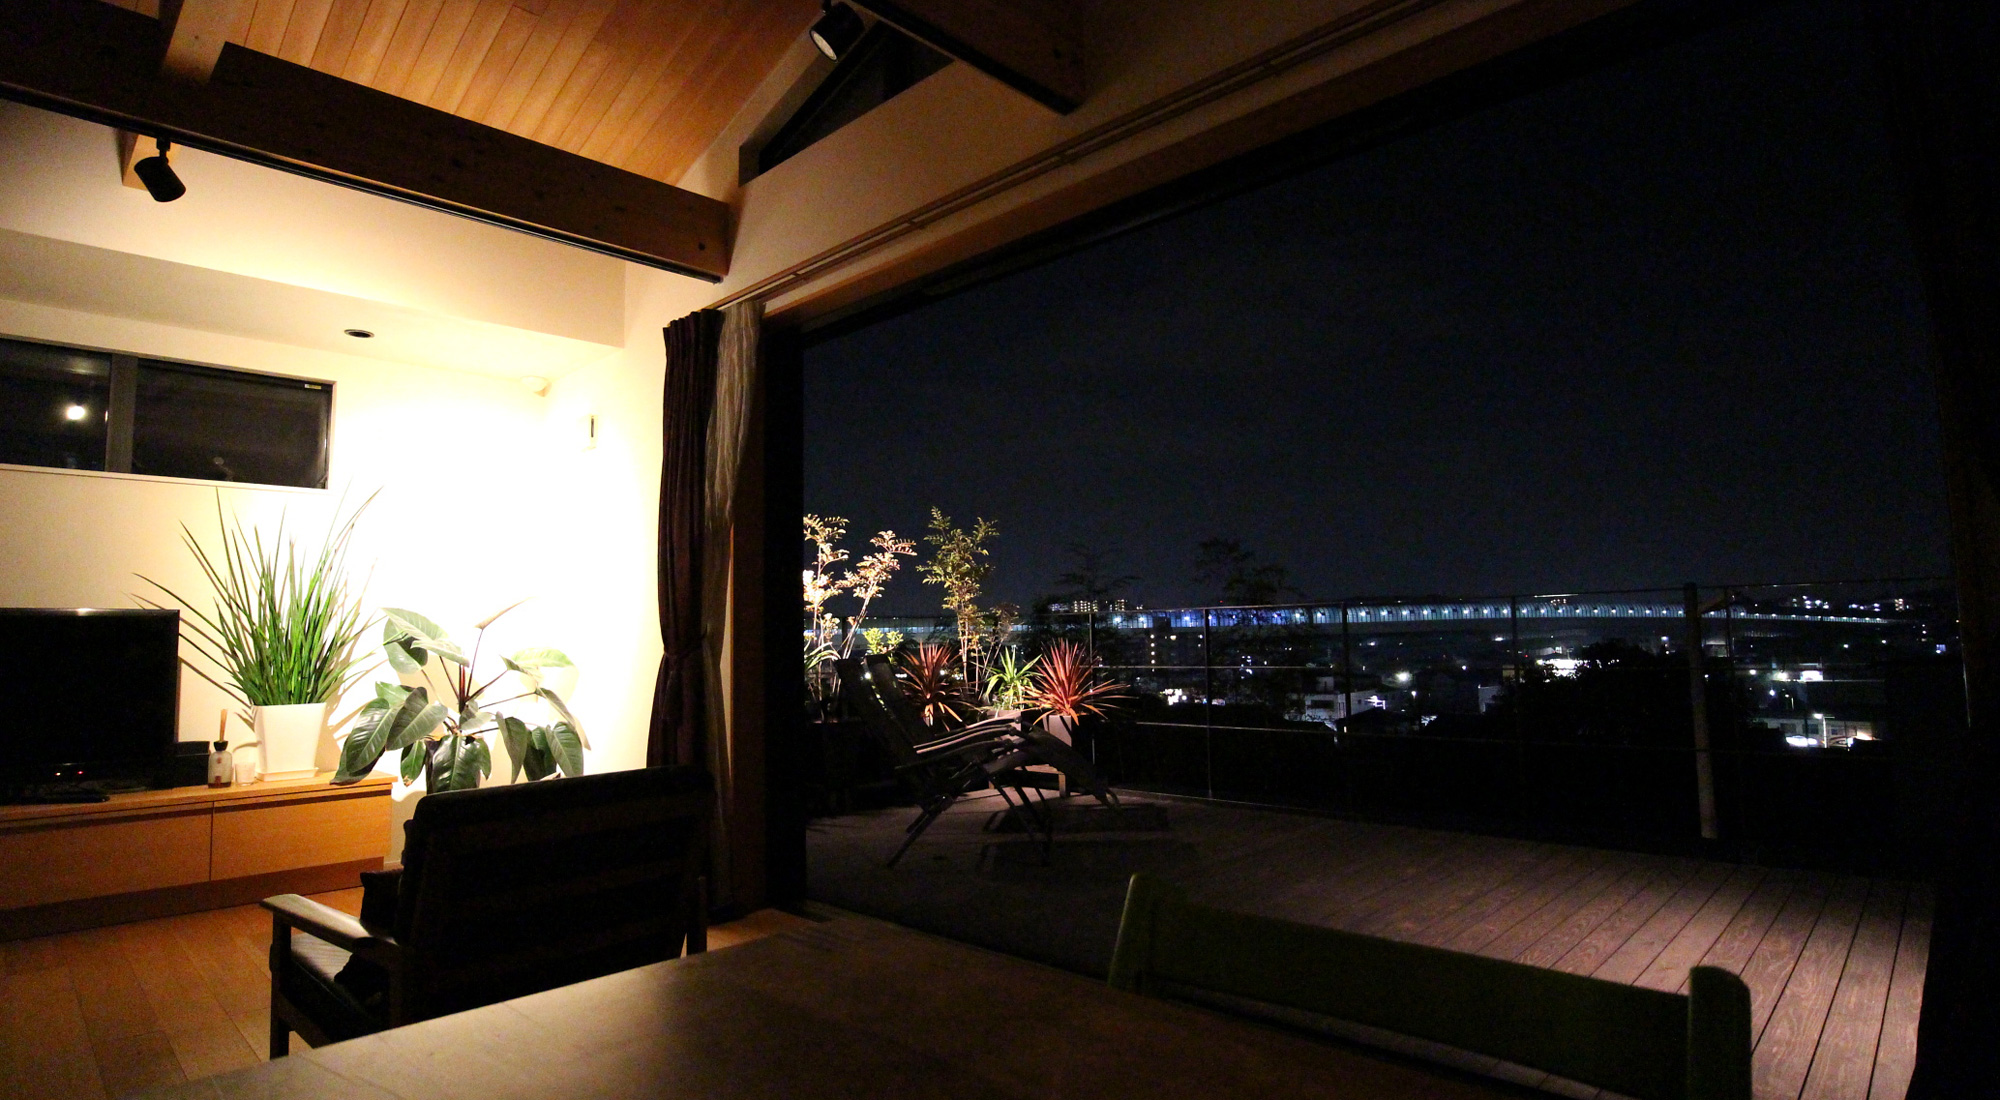 ART HOUSING | 家・土地・不動産・リフォームの株式会社アートハウジング